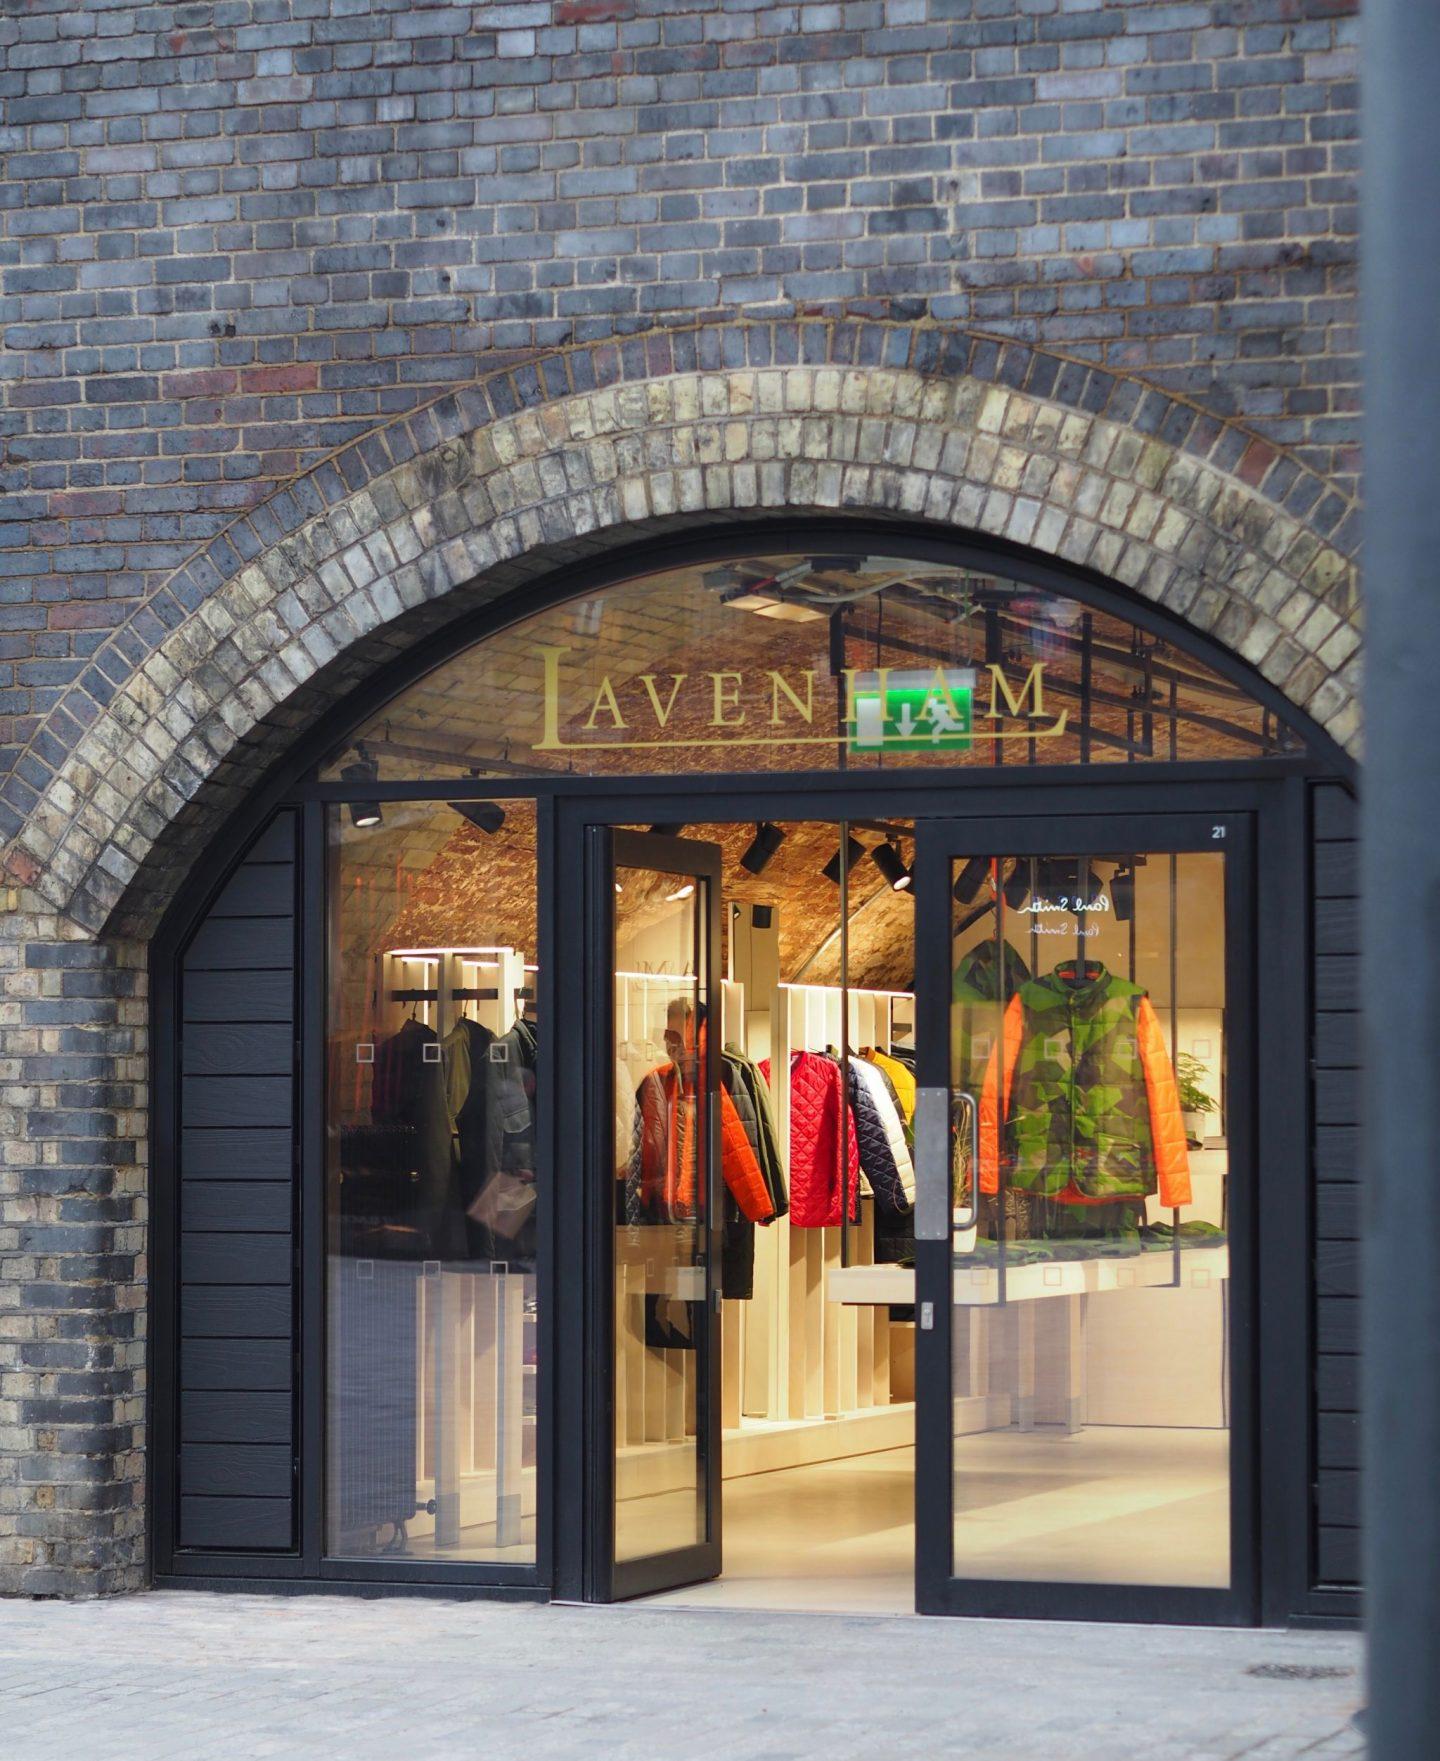 Coal Drops Yard, Lavenham,British Heritage Brand, Mary Middleton for Hello Peagreen